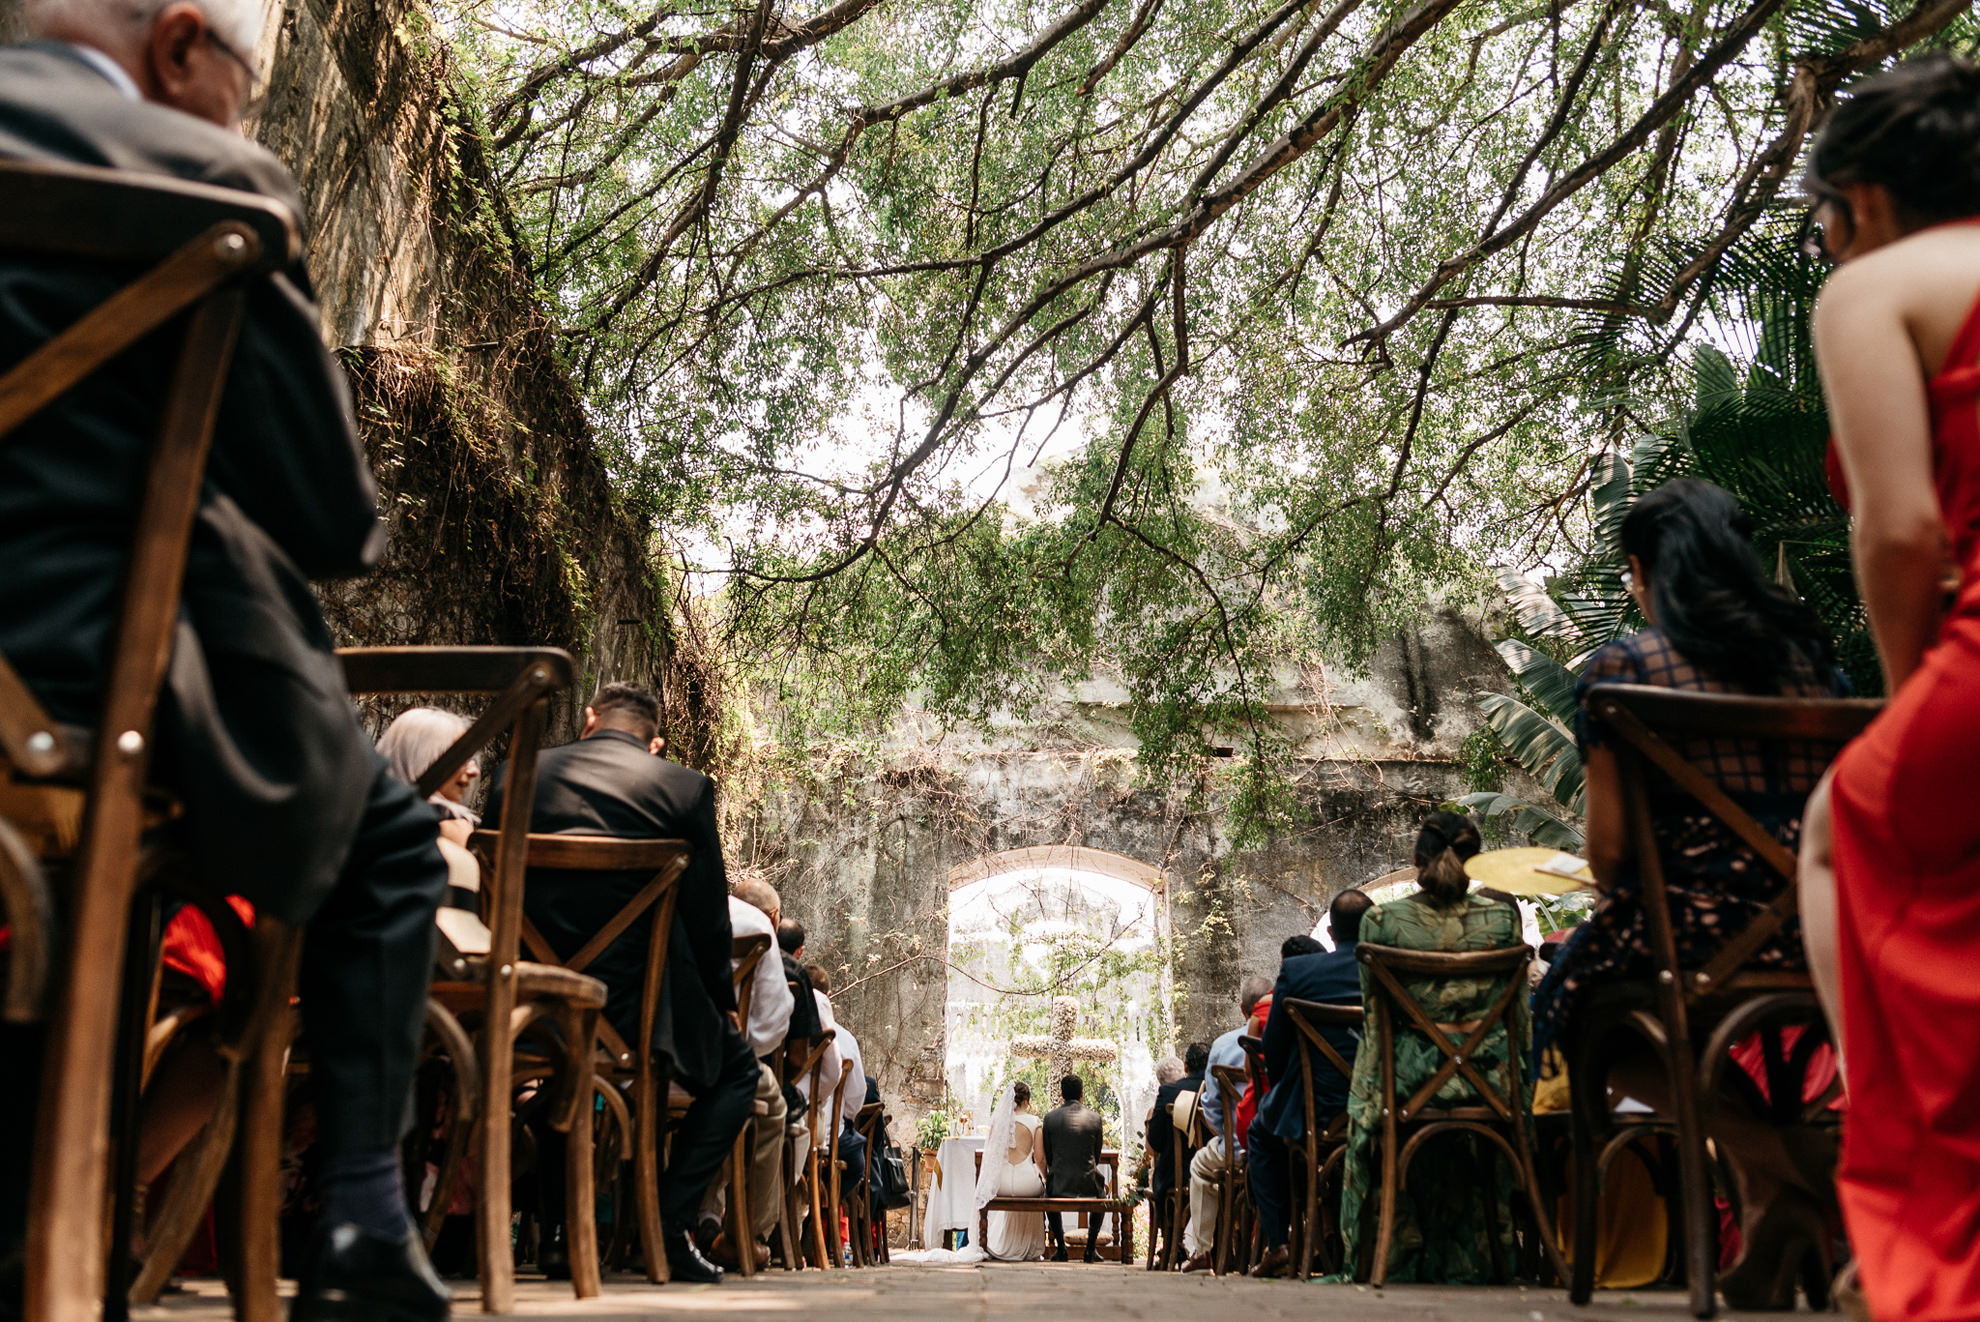 051 - hacienda san carlos.jpg